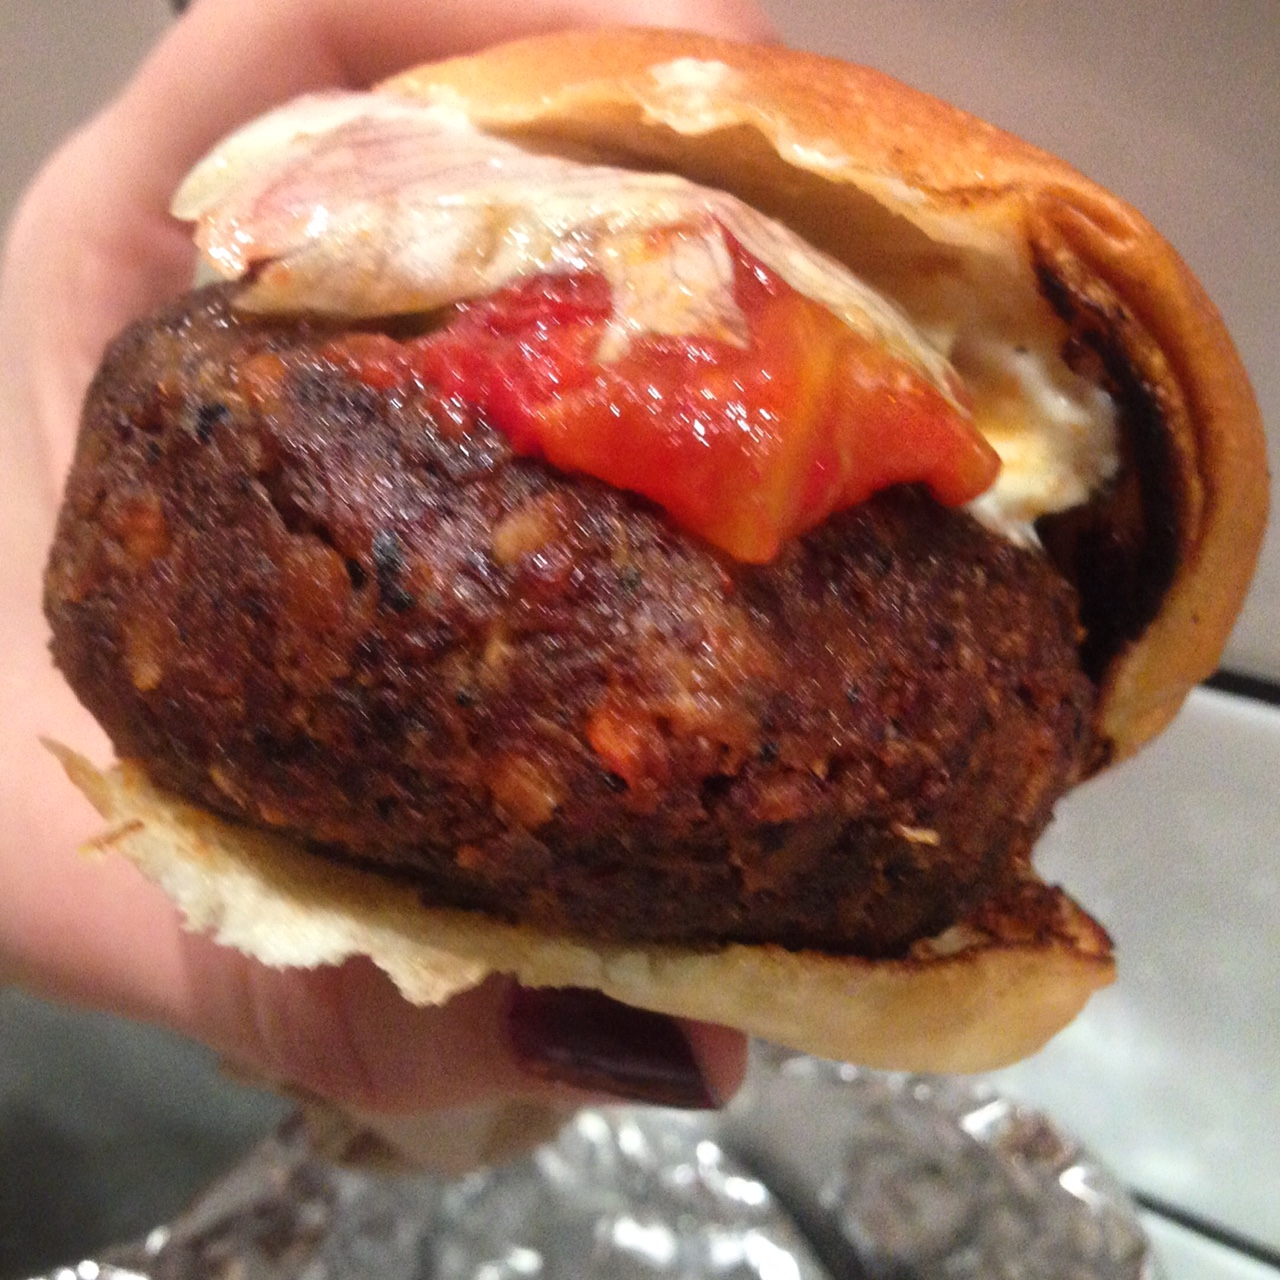 A good shot of the Superiority Burger (Picture: Deni Kirkova)